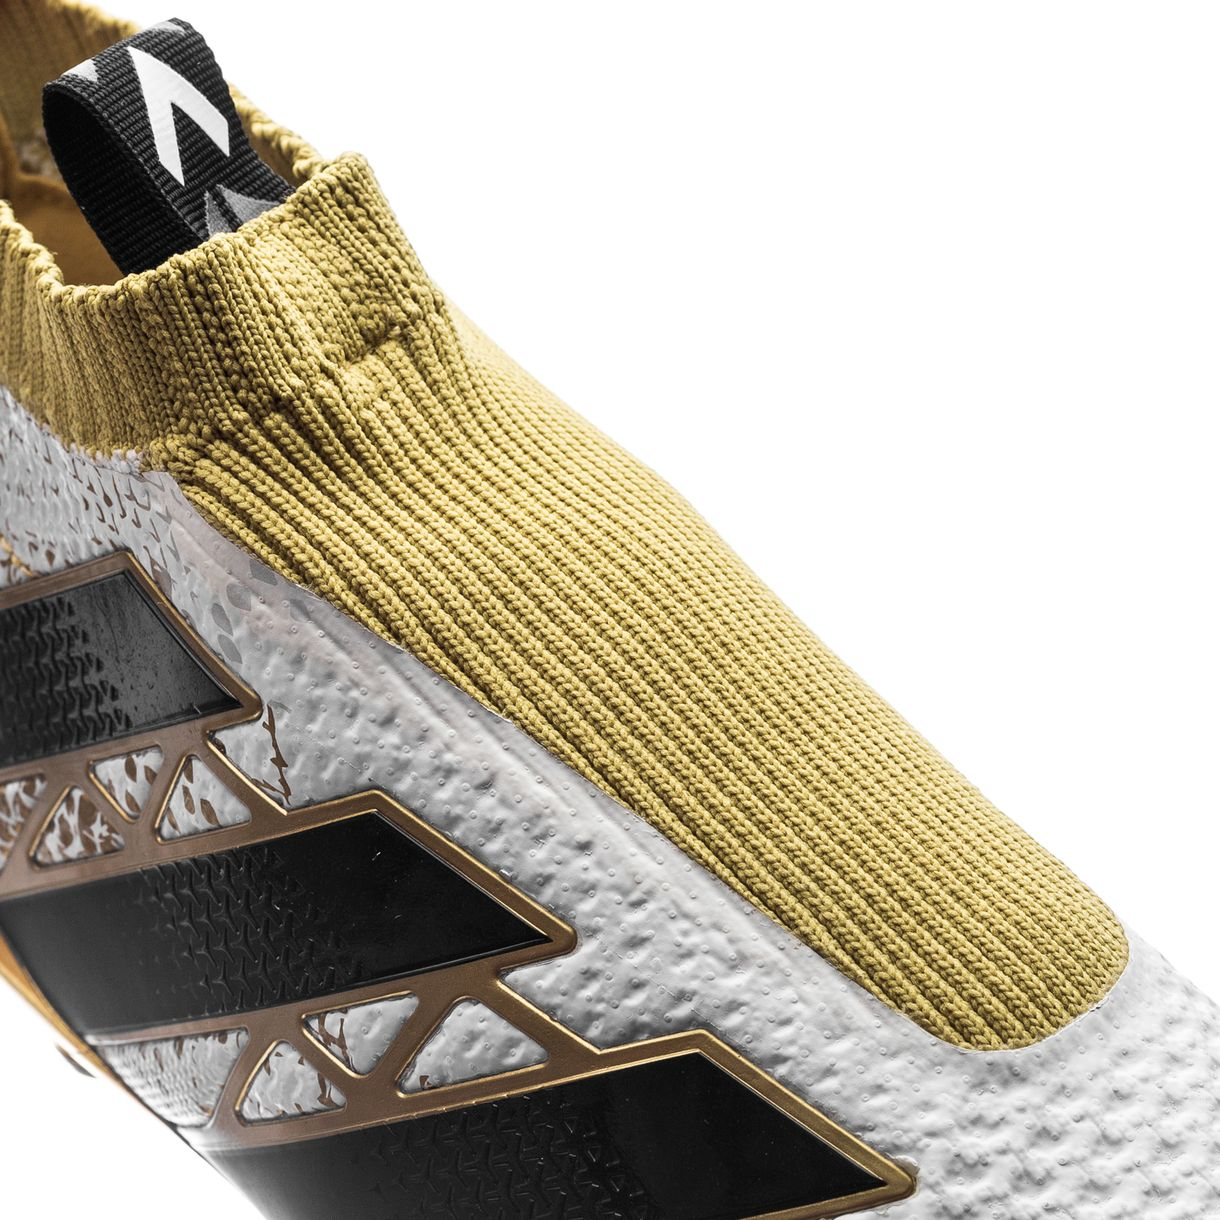 ... Click to enlarge image  adidas ace 16 purecontrol fg ag stellar pack white core black gold metallic f.jpg  ... 6c97cf84db